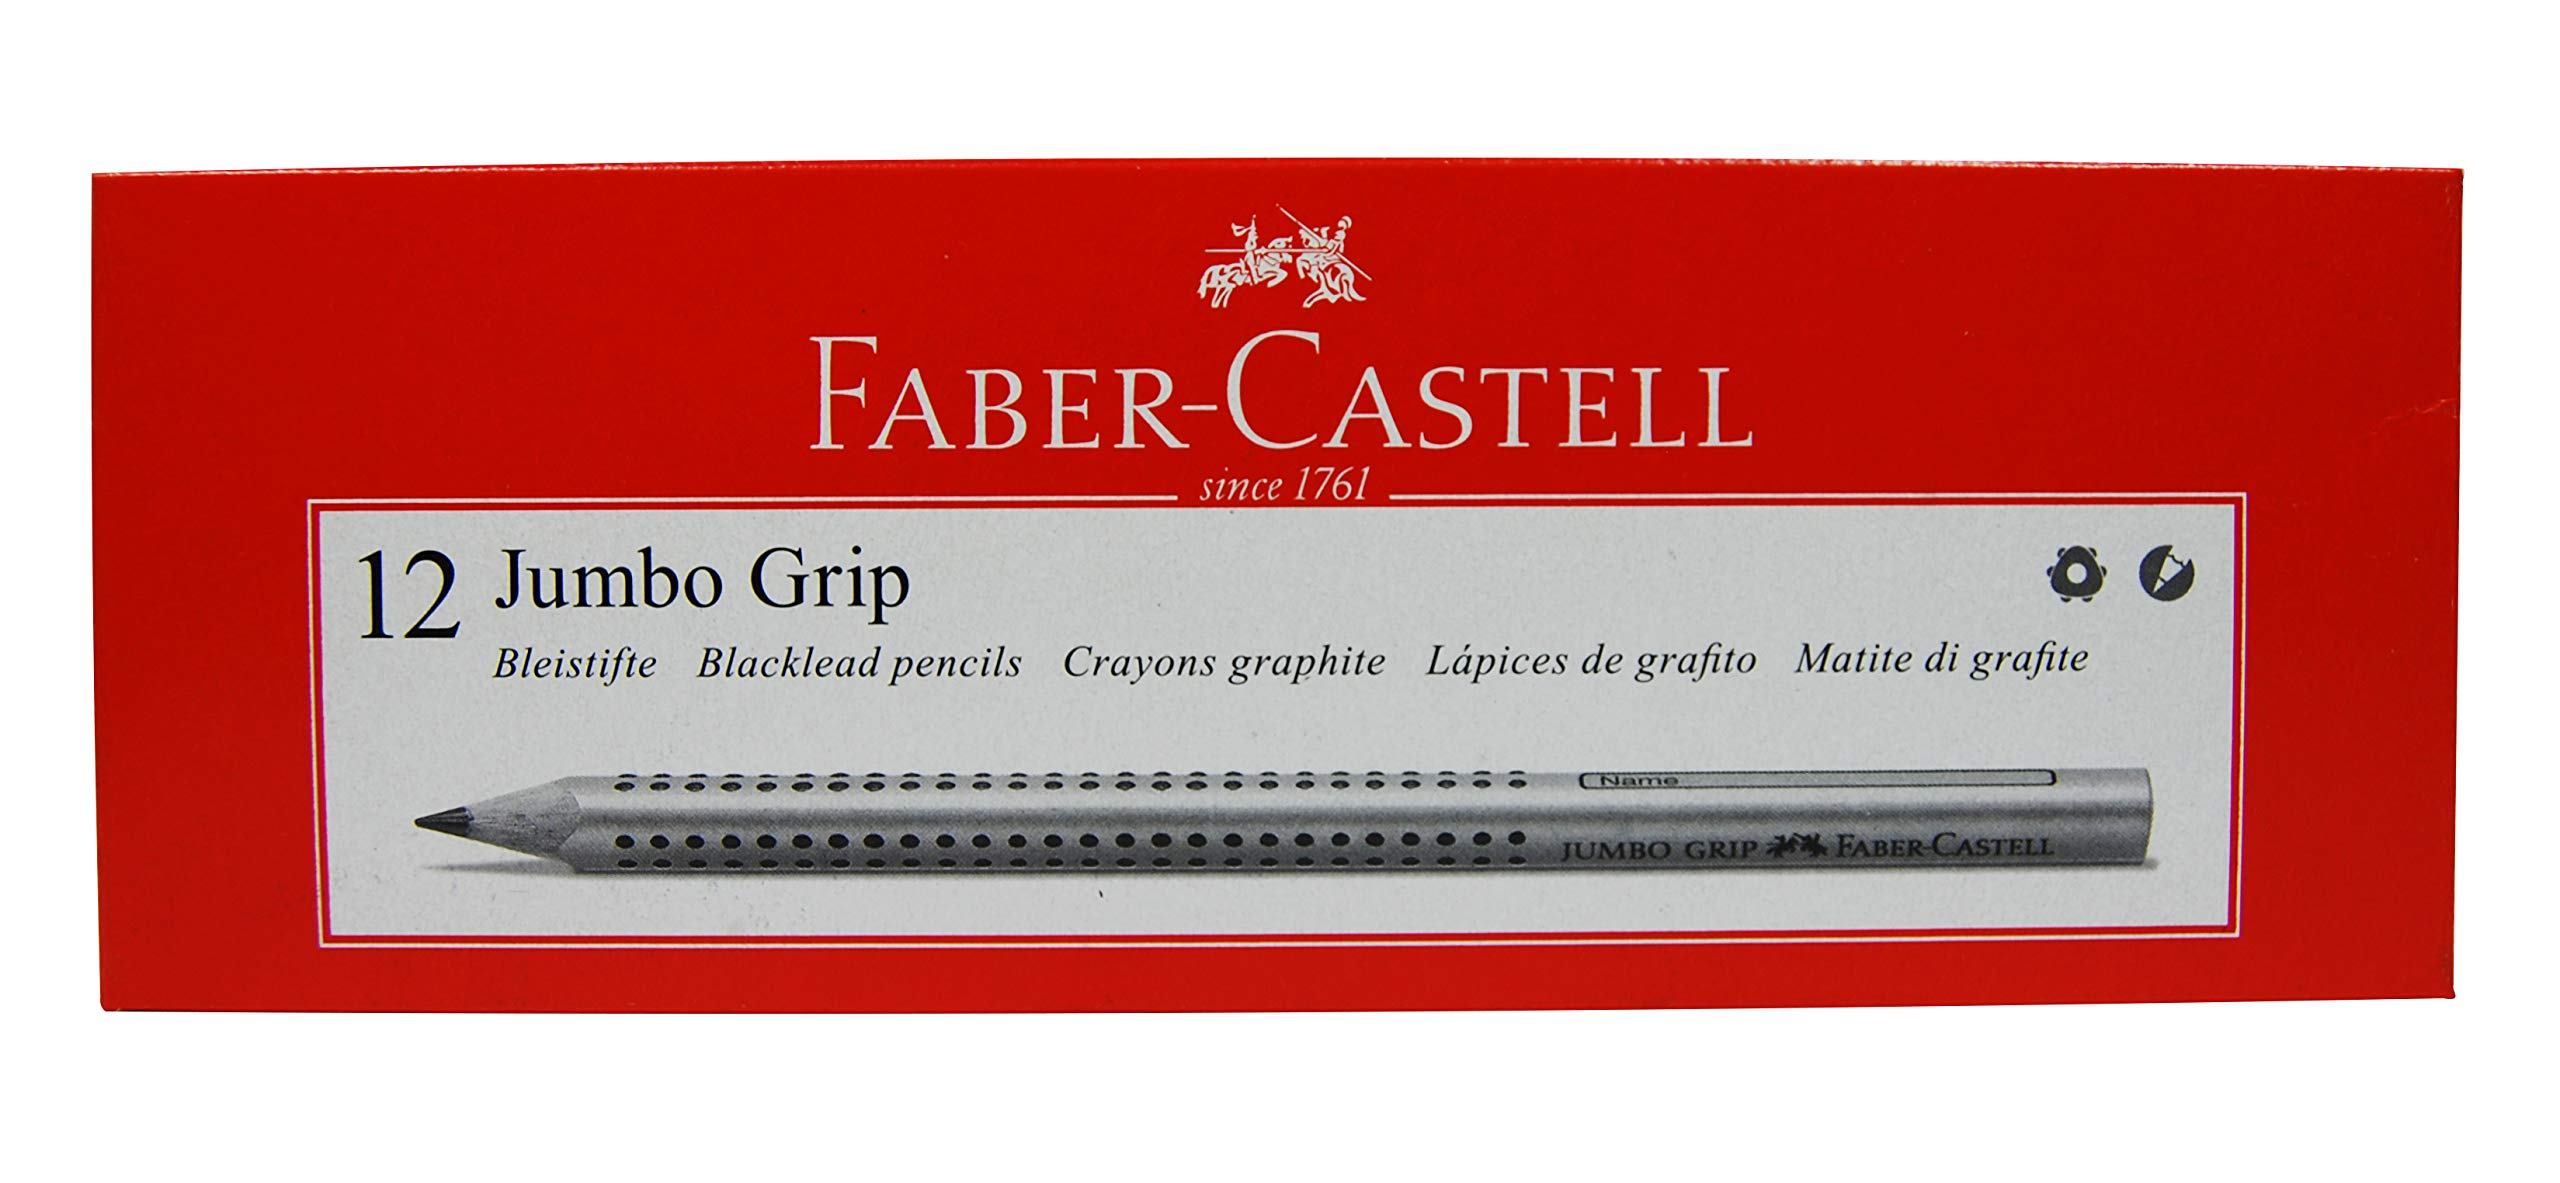 Faber-Castell 12 Count Jumbo Grip Graphite Pencils